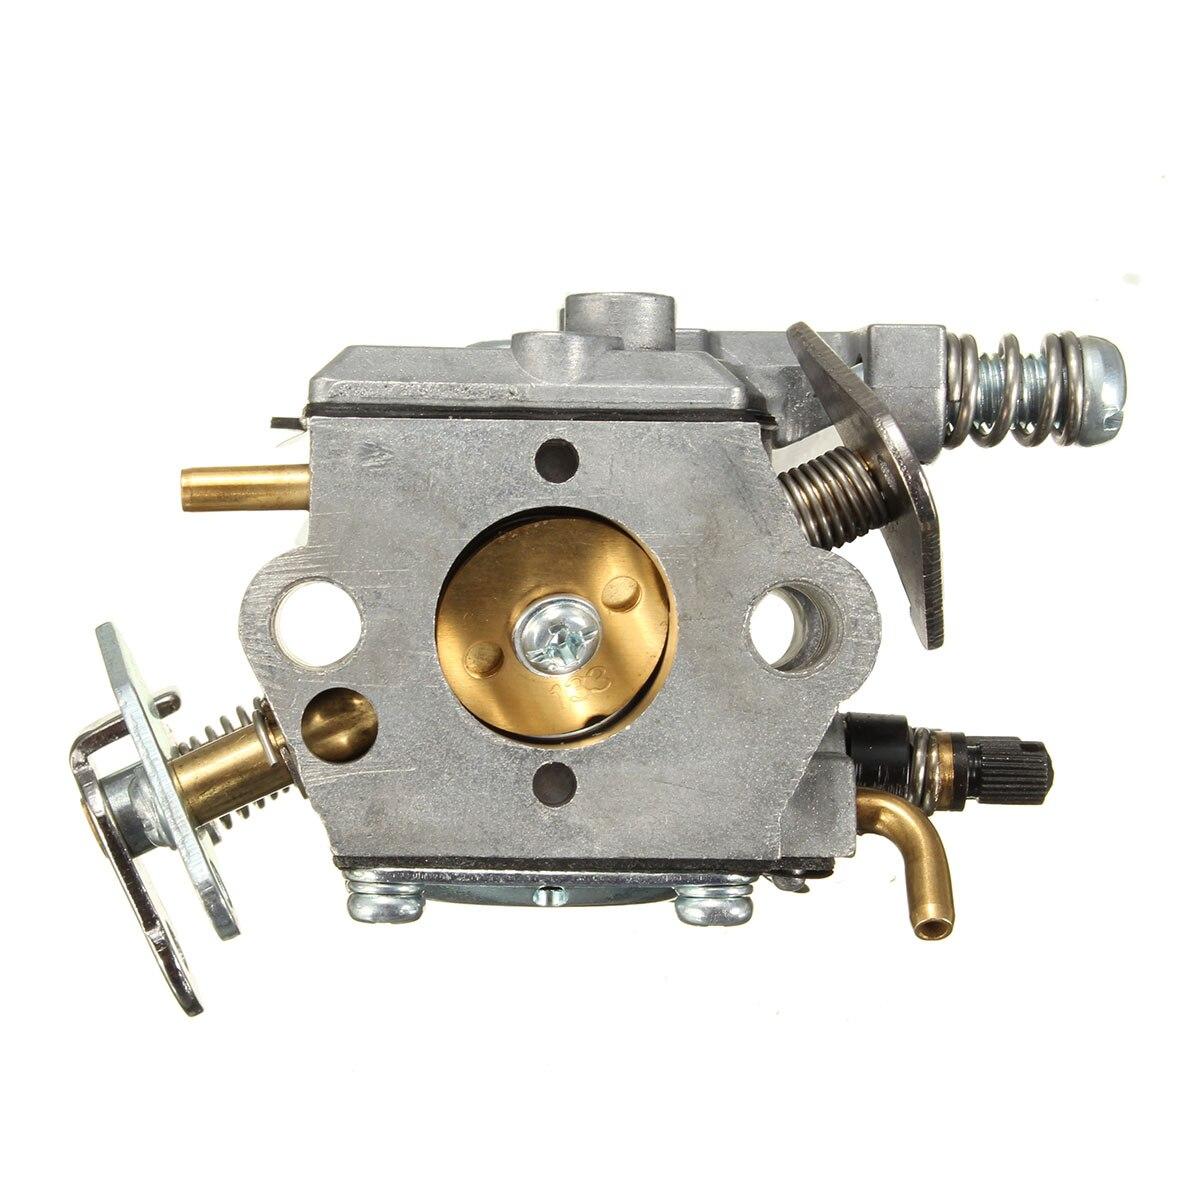 Tondeuse Carburateur pour Poulan Tronçonneuse 1950 2050 2150 2375 Walbro WT 89 891 Zama 530069703 530035343 530071620 545006058